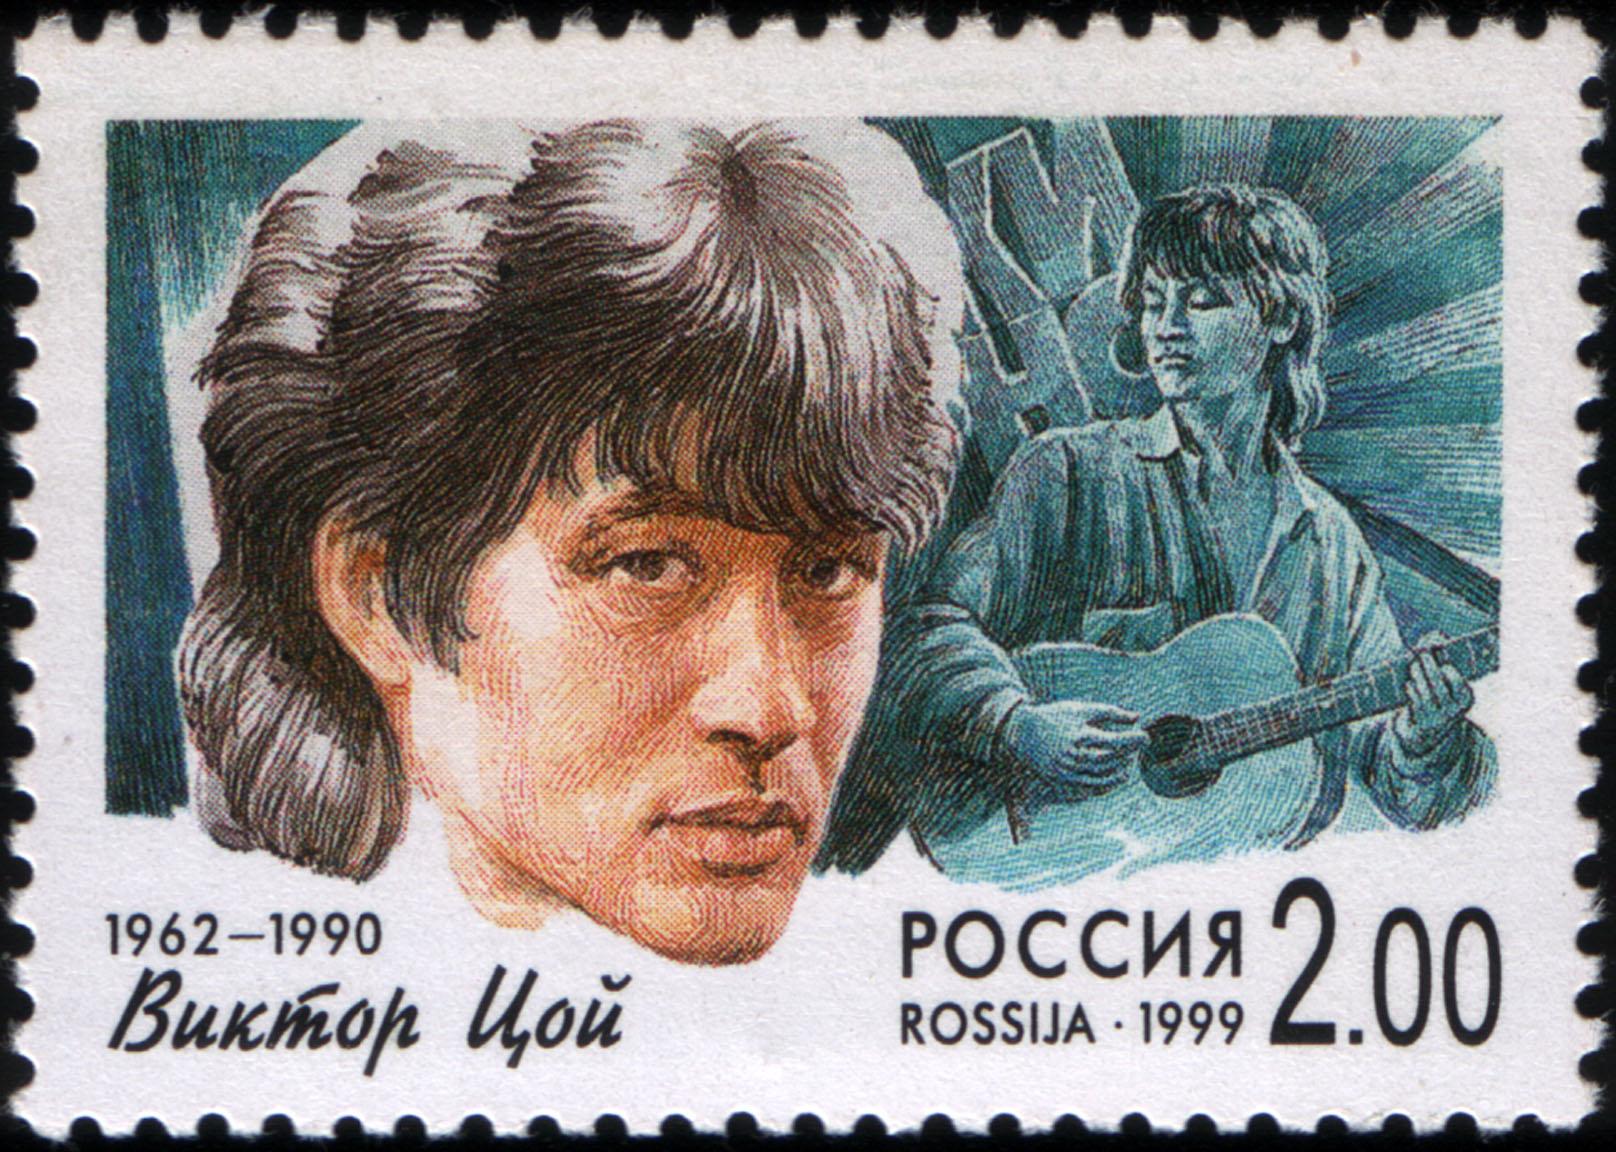 The son of Viktor Tsoi: biography and creativity 91